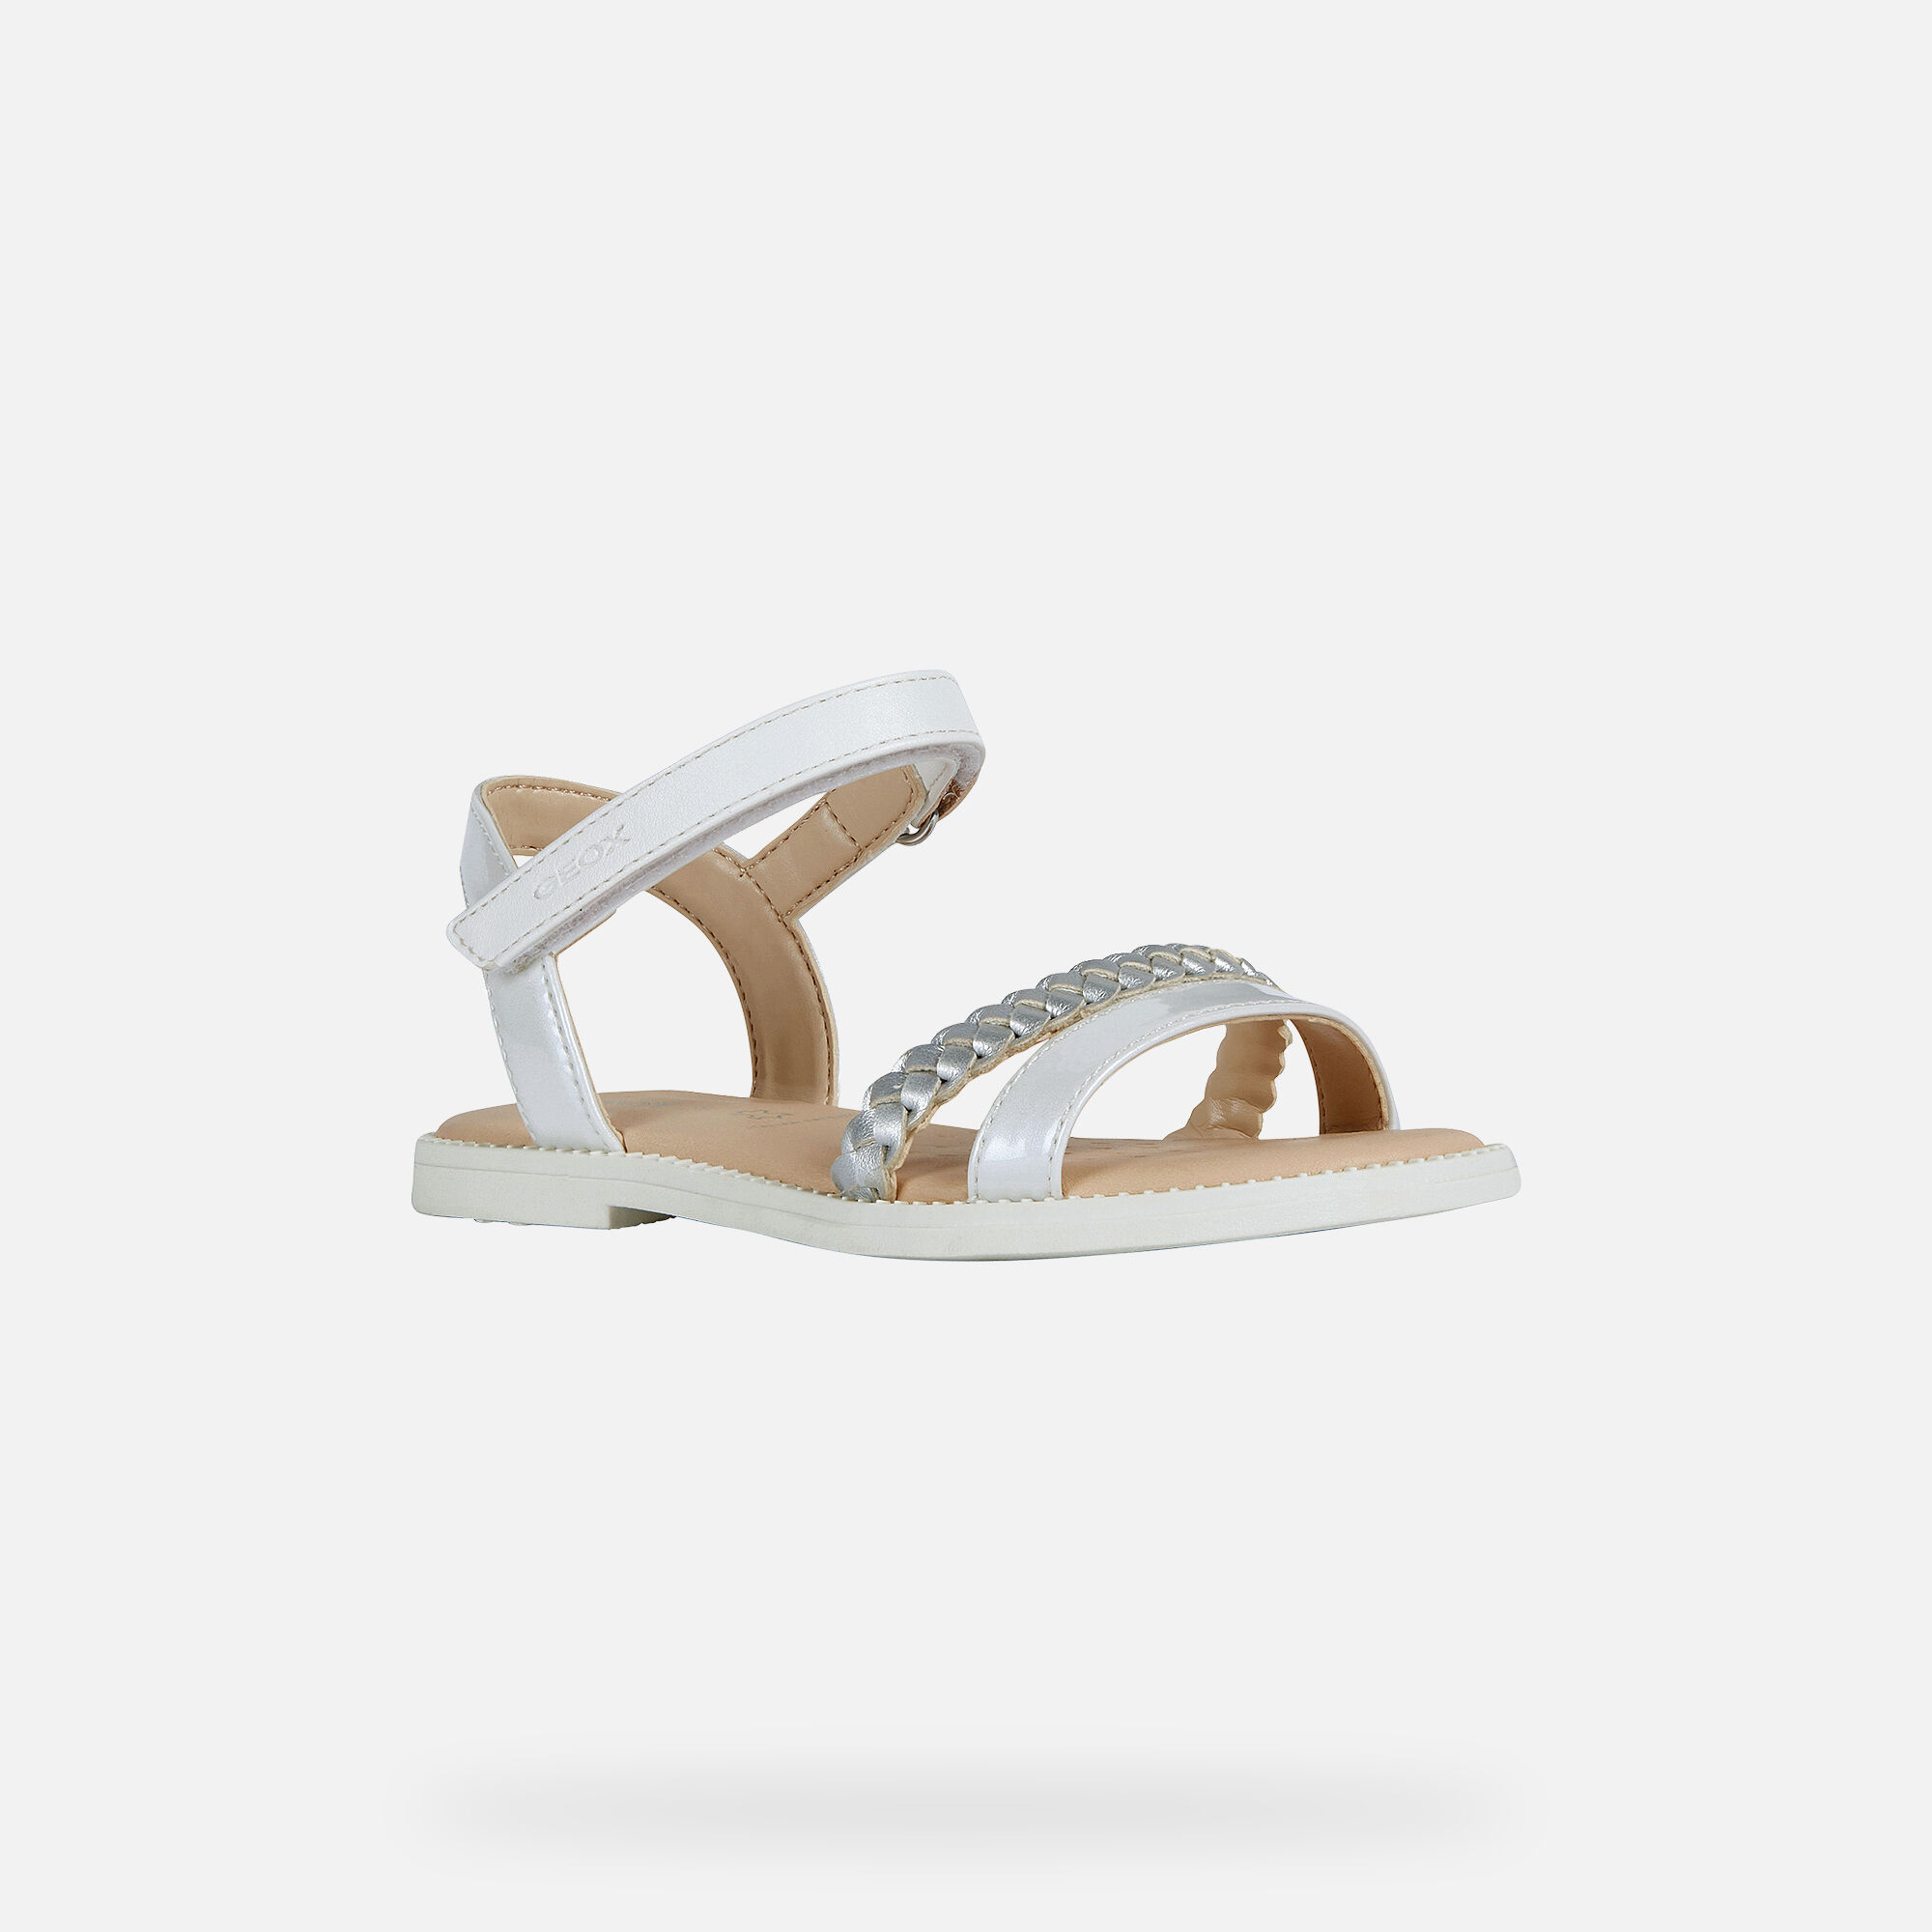 Geox Karly sandalia blanca